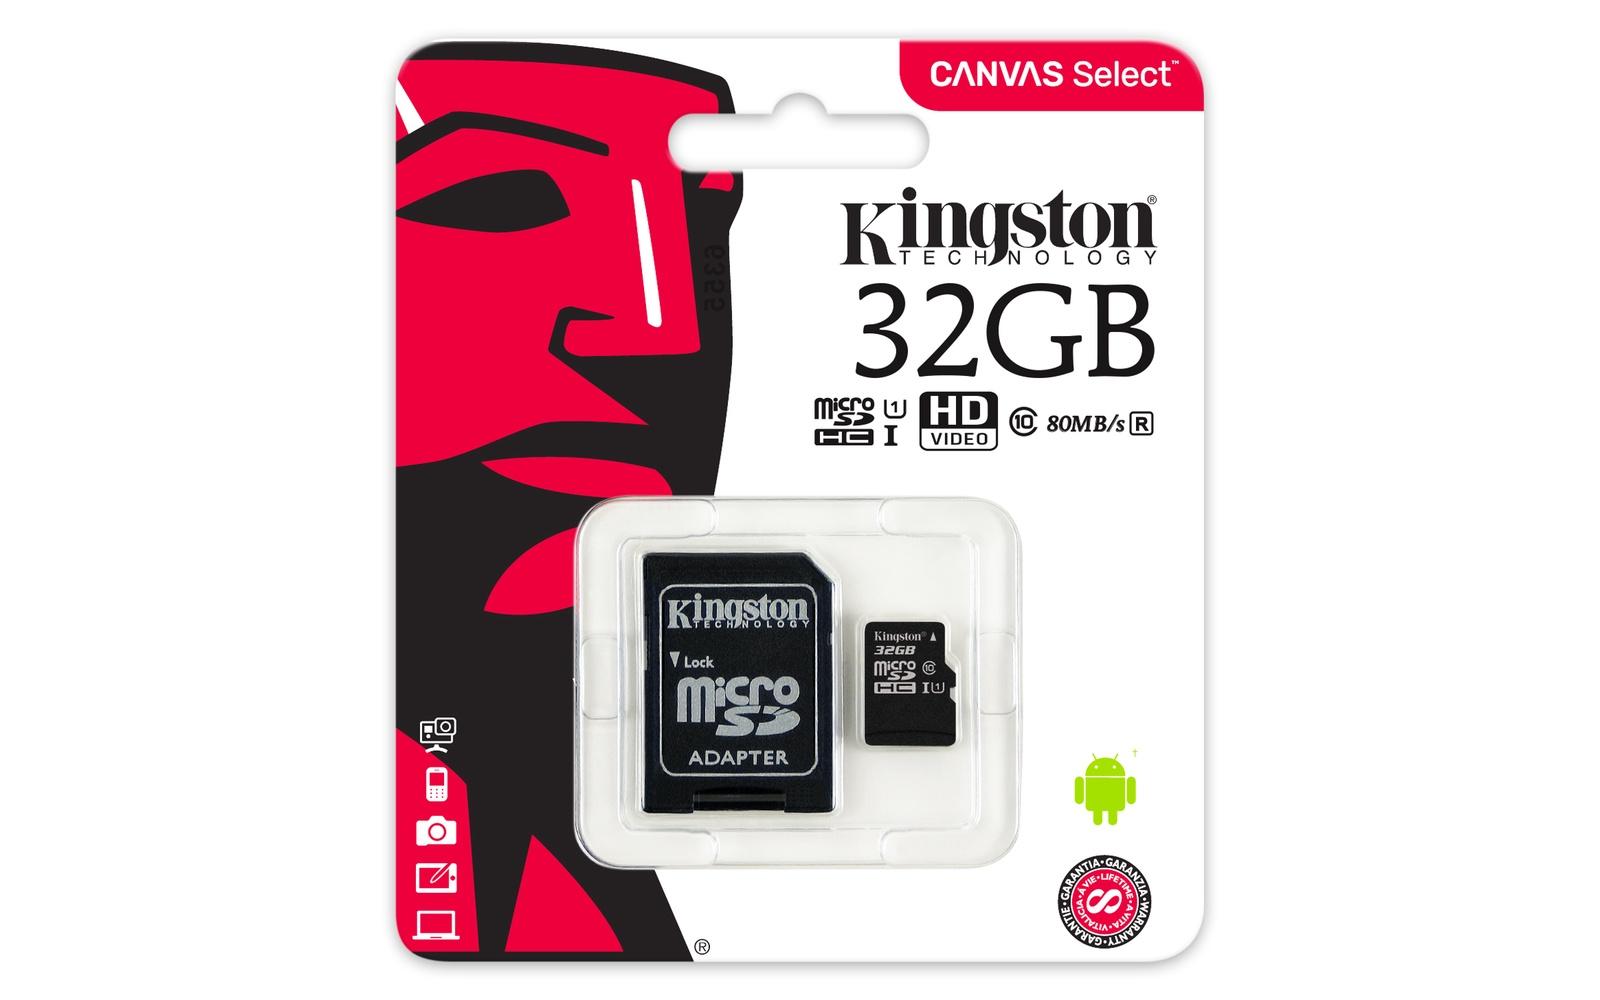 Карта памяти Kingston Canvas Select microSDHC Class 10 UHS-I U1 32GB + SD adapter (SDCS/32GB) карта памяти samsung 32gb uhs i u1